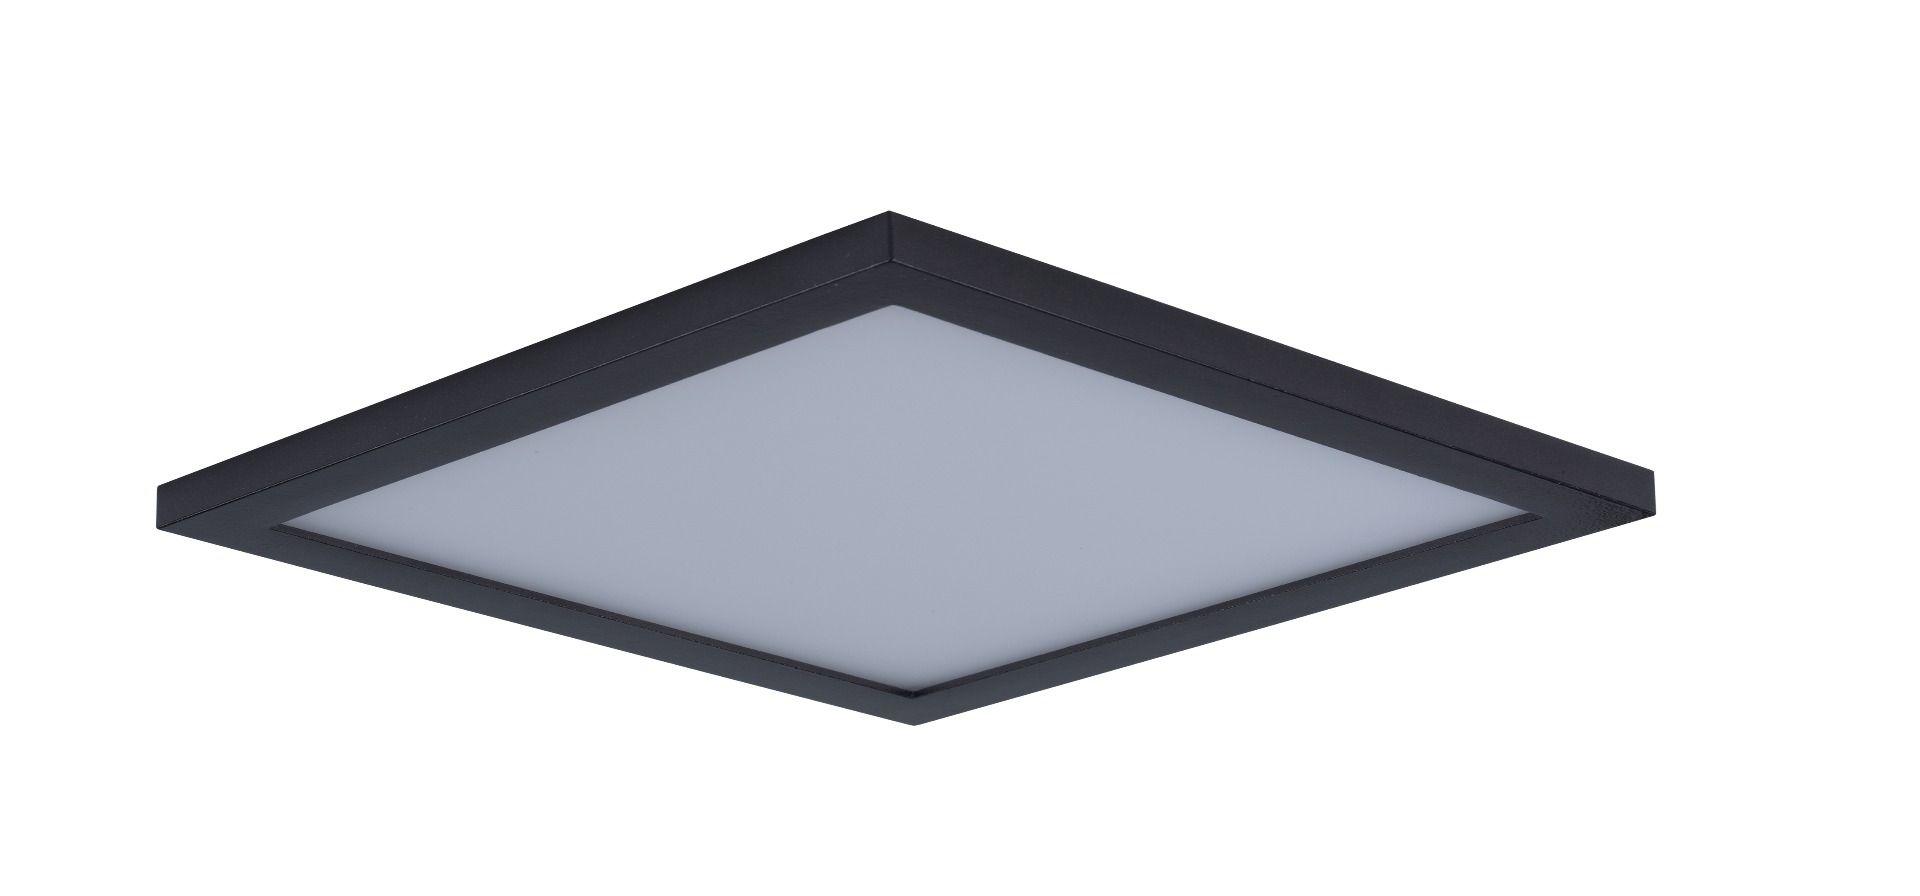 Maxim Lighting Wafer Led 15 Square Ceiling Light In Bronze